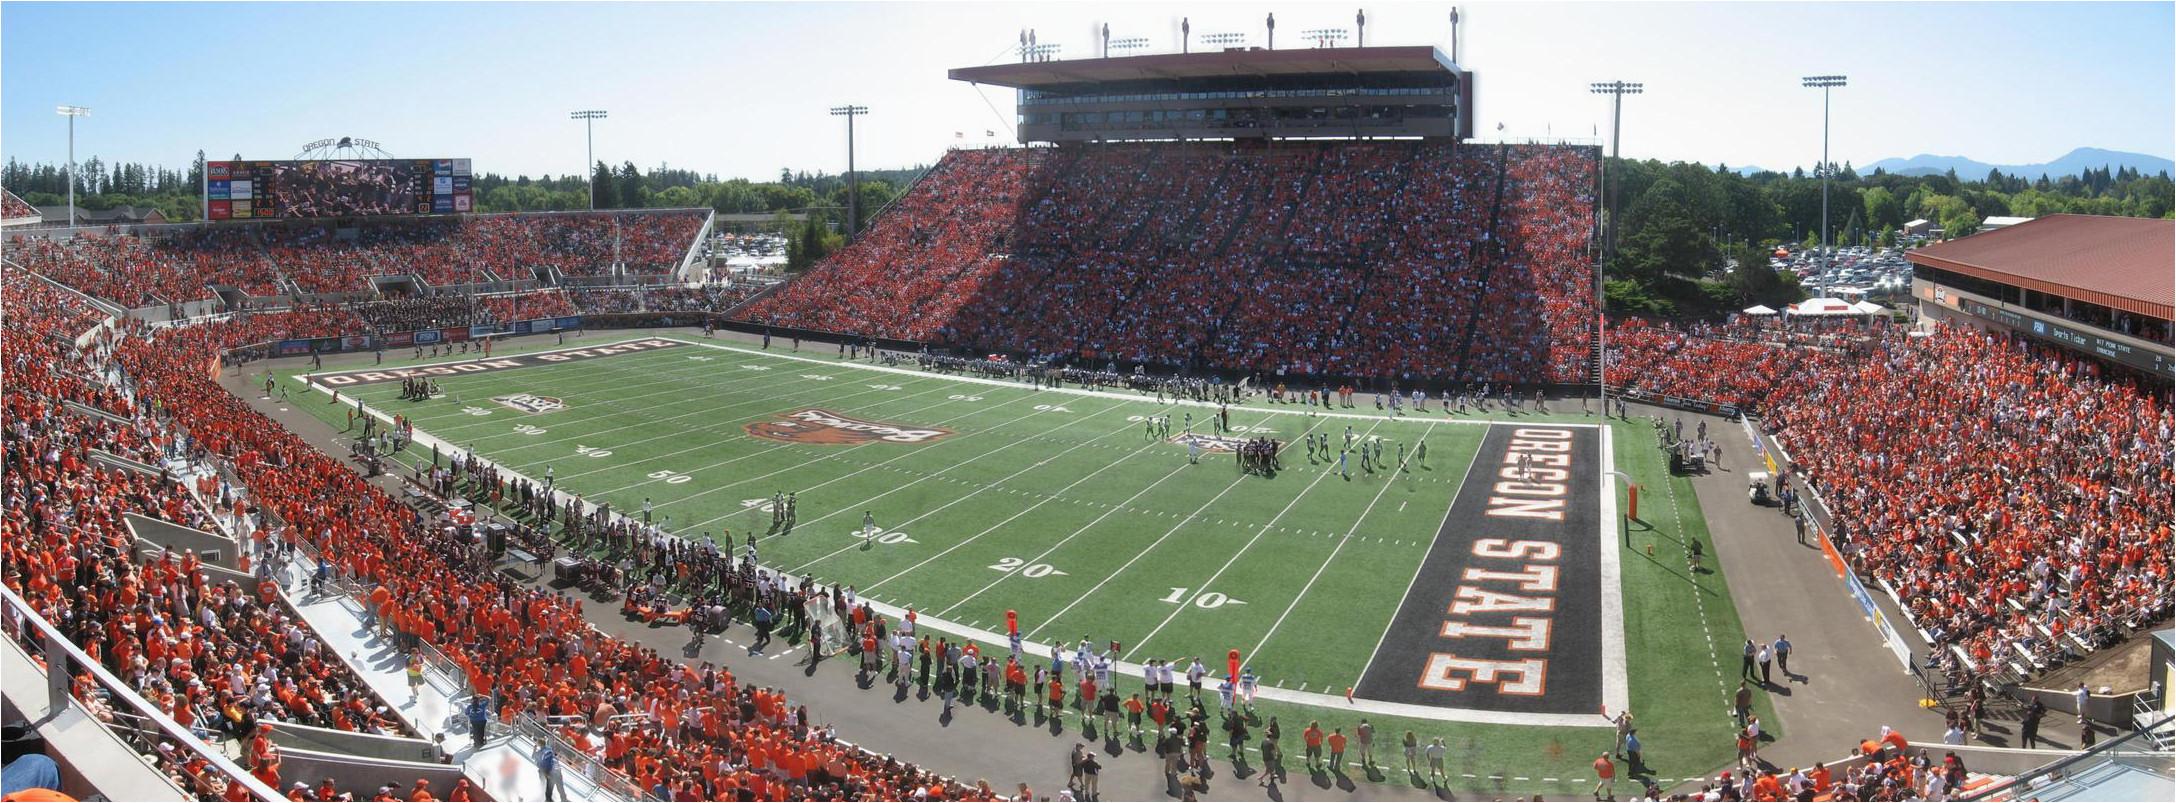 arizona stadium seating chart seatgeek